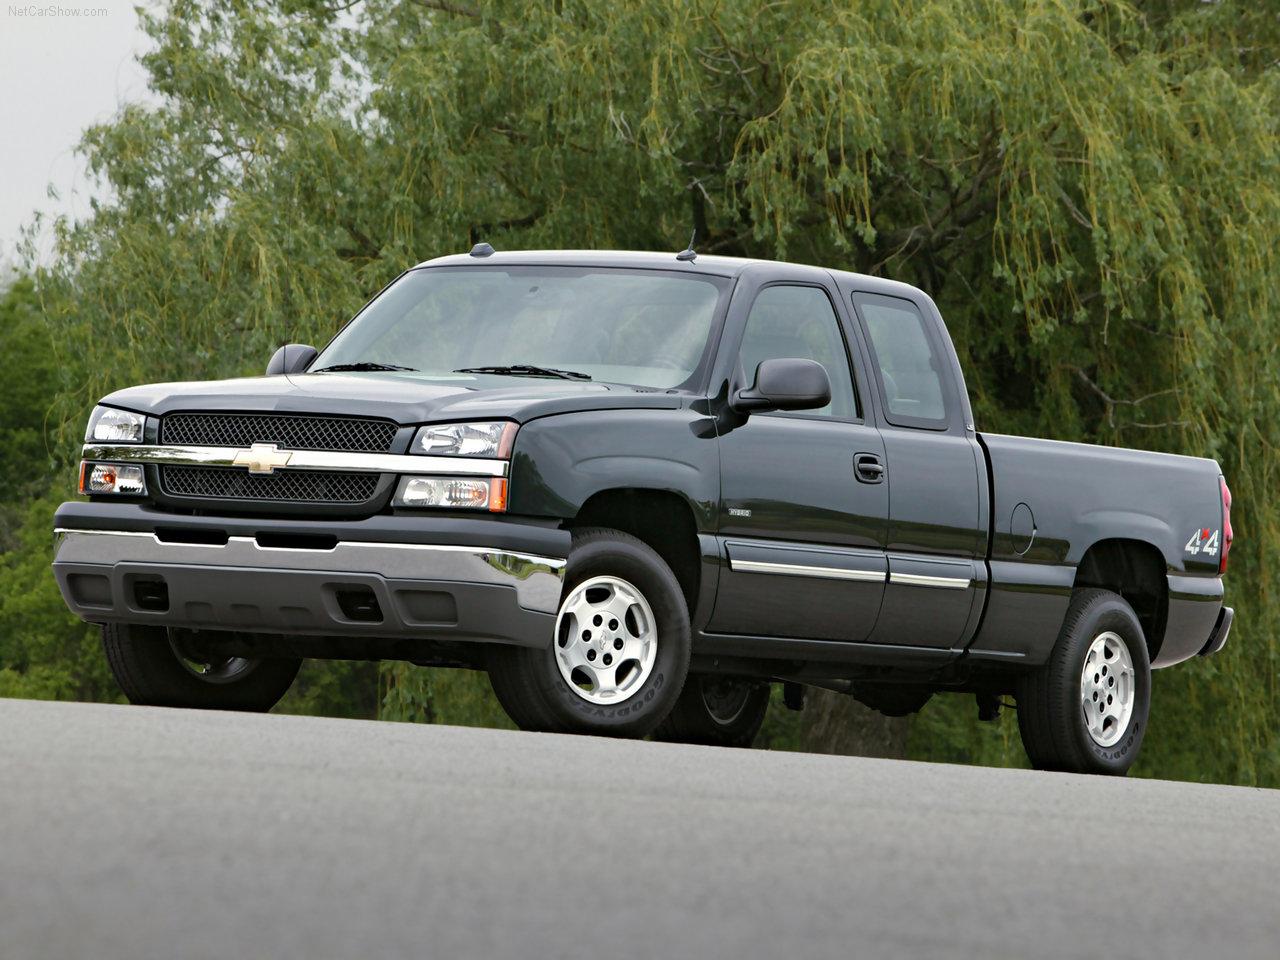 http://1.bp.blogspot.com/-iFfbOxHPcEY/TXnBG97O_2I/AAAAAAAAM7I/lbJwDhSKTbo/s1600/Chevrolet-Silverado_Hybrid_2005_1280x960_wallpaper_02.jpg